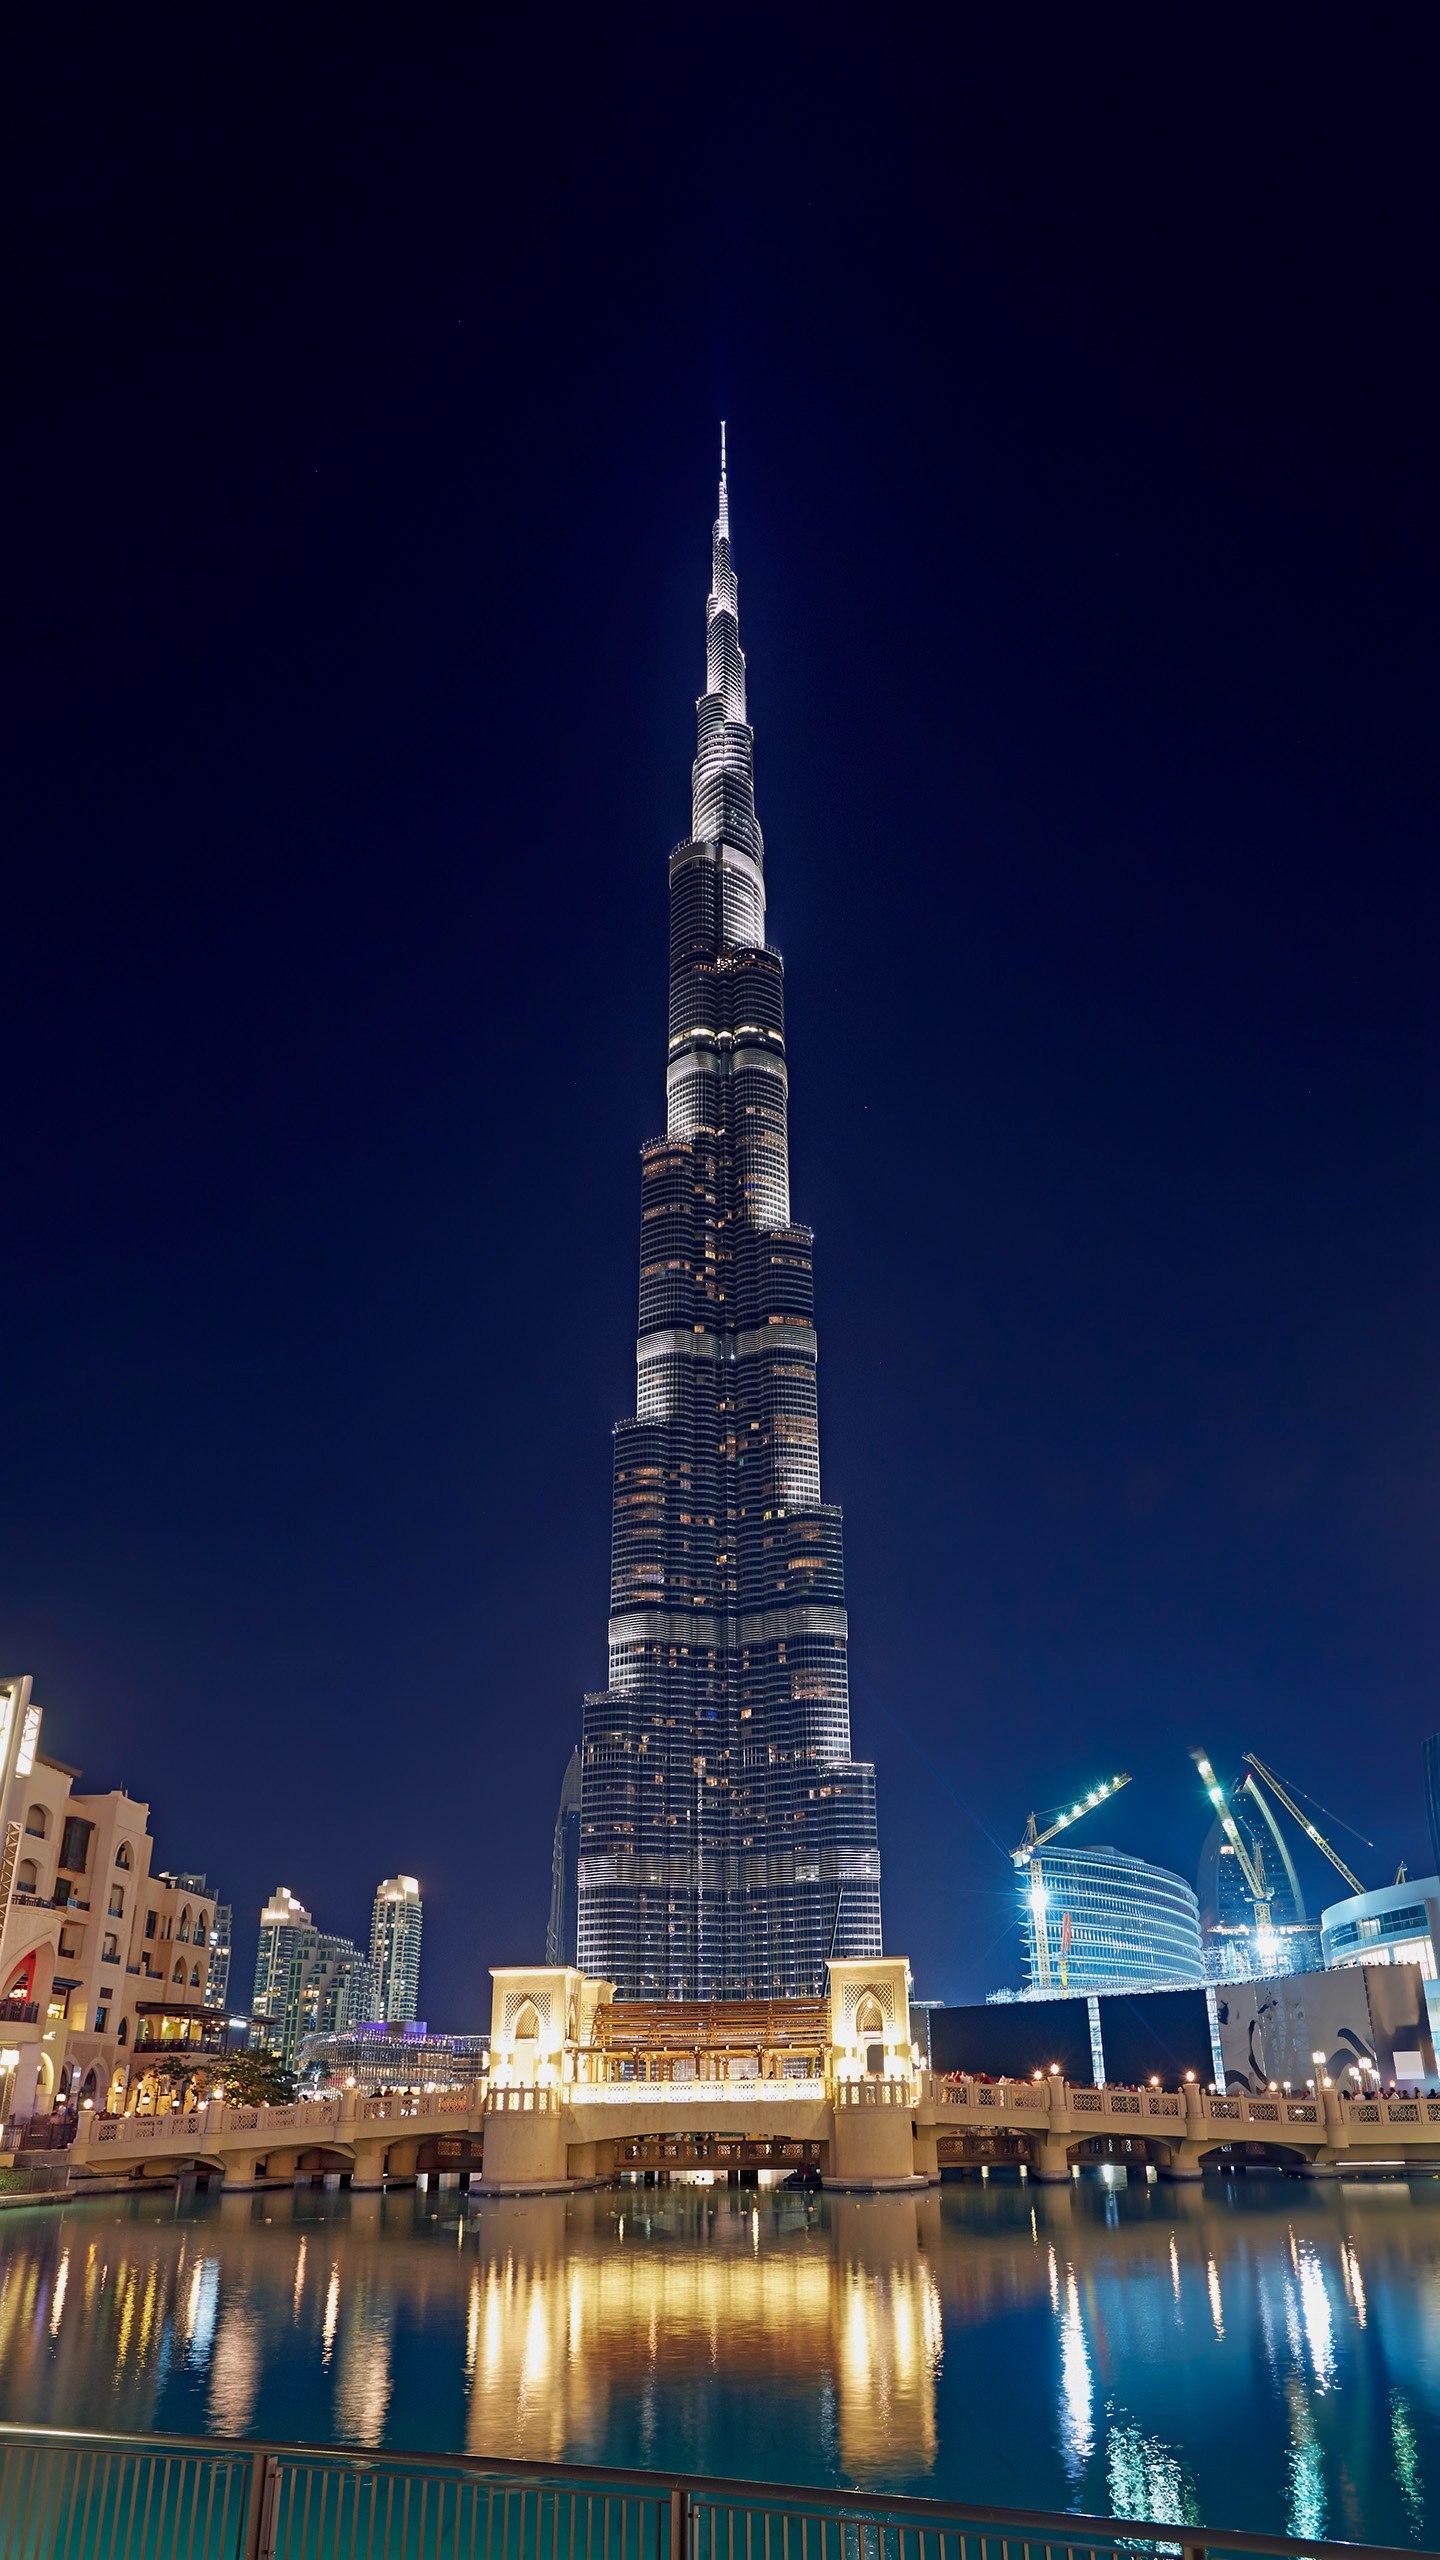 Dubai. World-renowned international metropolis with amazing architectural wonders.